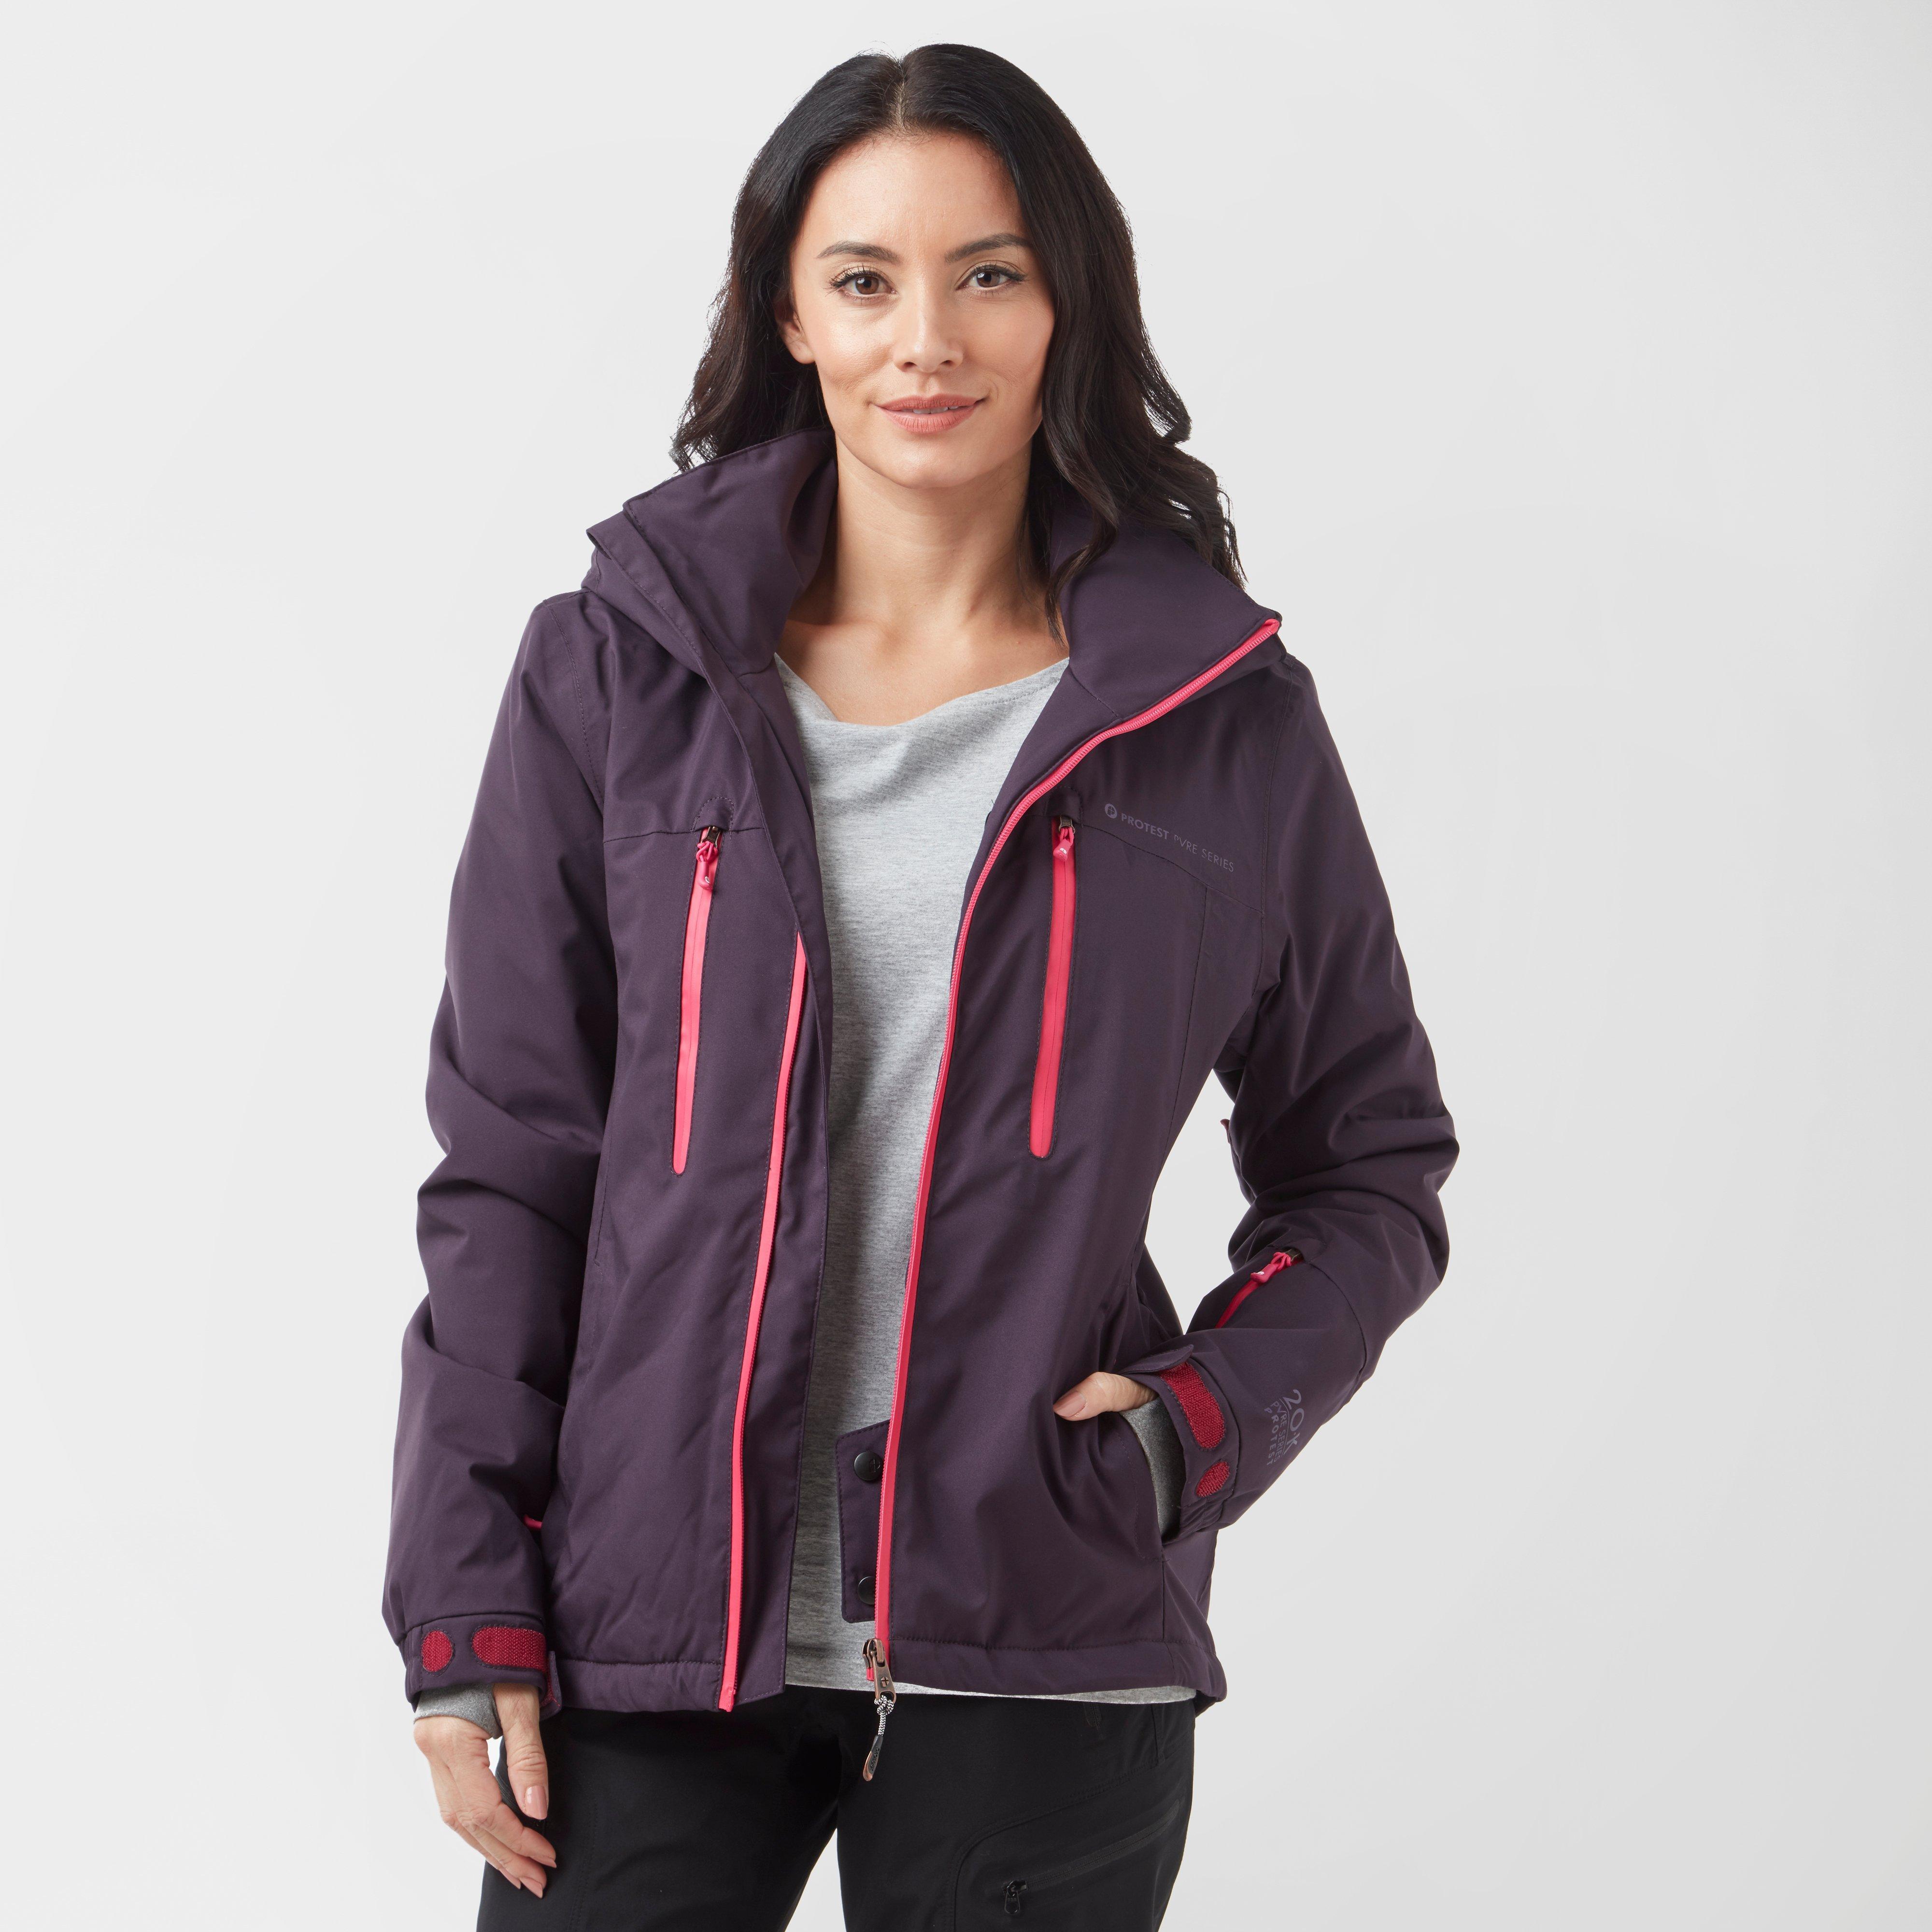 Protest Women's Giggile 18 Ski Jacket, Purple